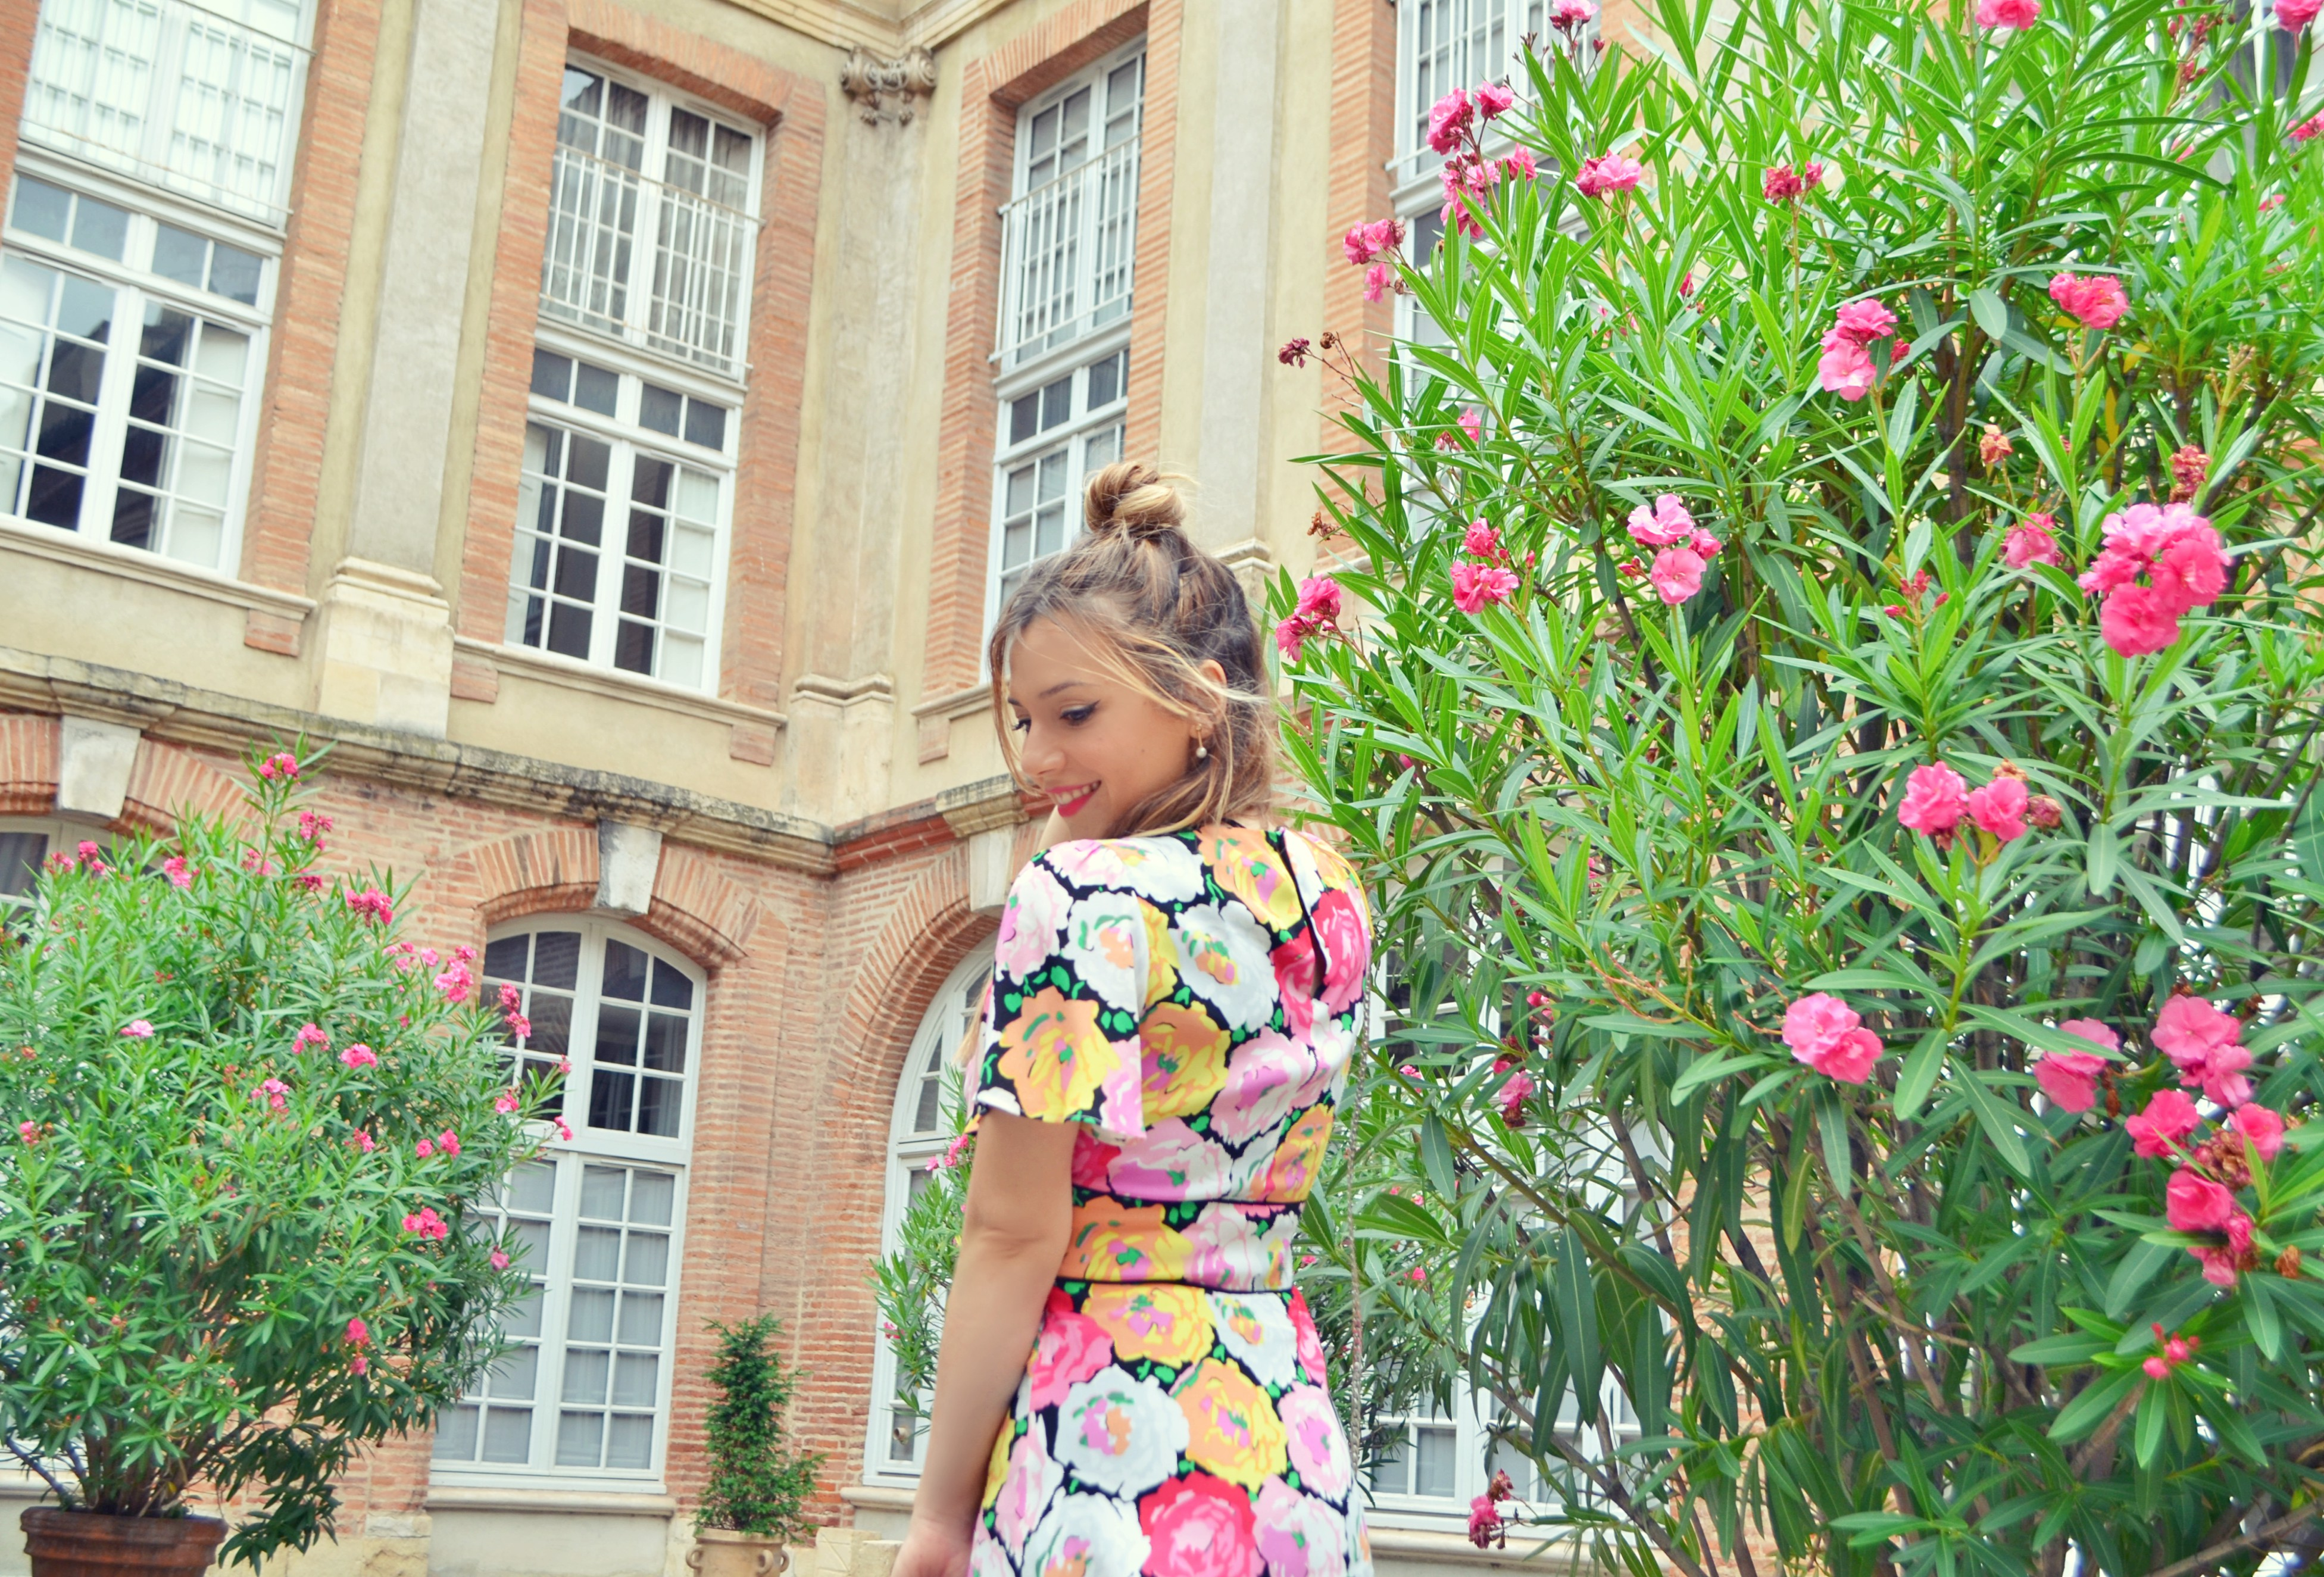 Blog-de-moda-Chic-Adicta-influencer-ChicAdicta-flower-dress-Zara-Que-ver-en-Toulouse-fancy-style-PiensaenChic-Piensa-en-Chic